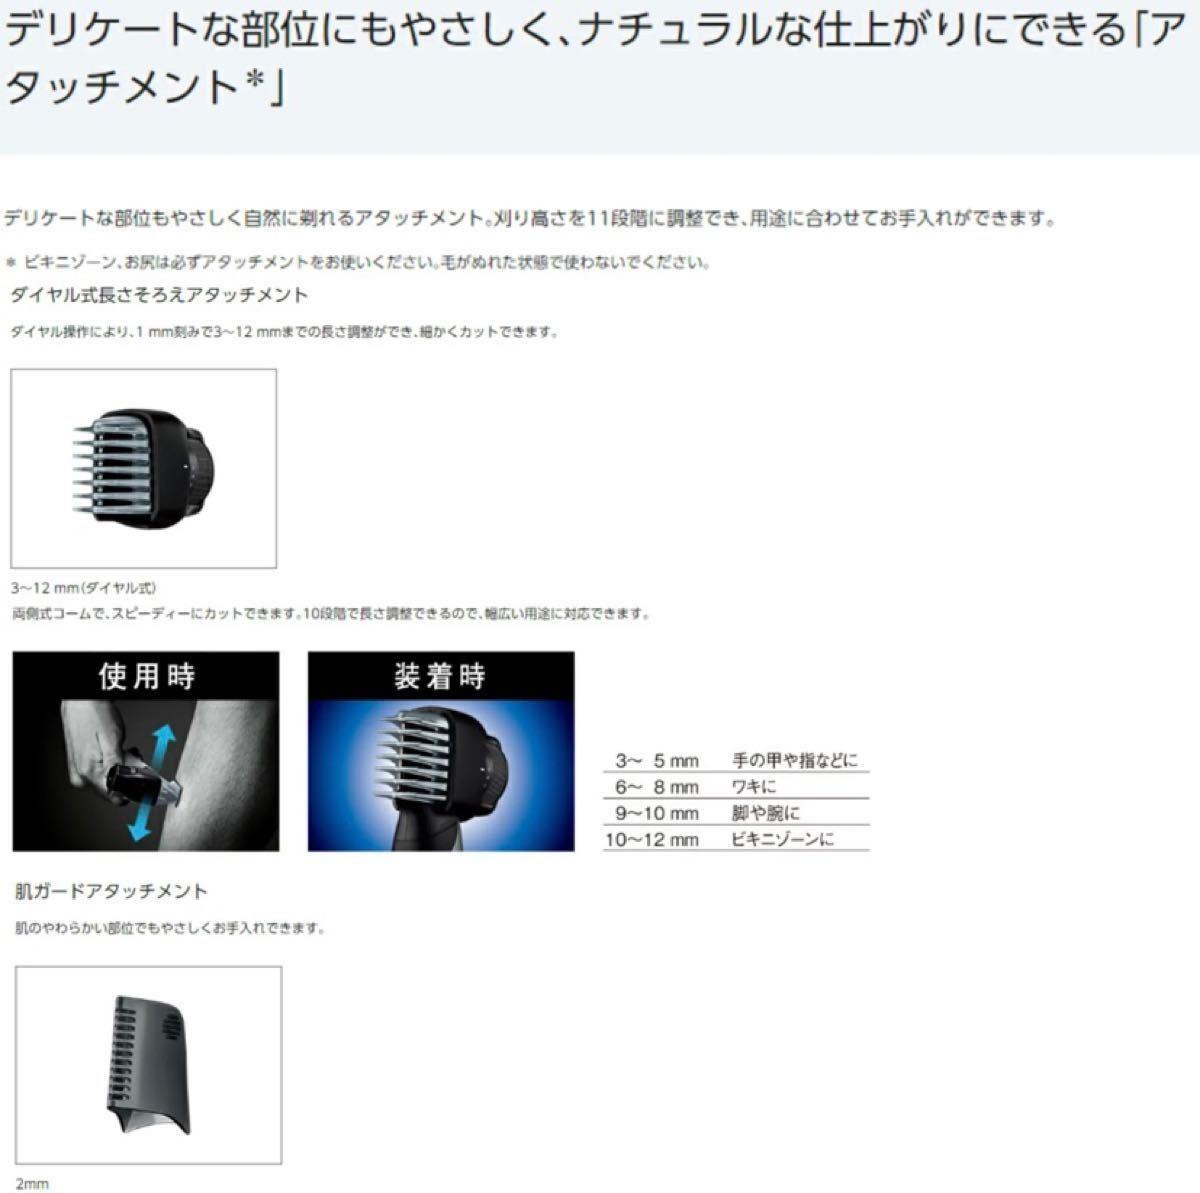 Panasonic パナソニック ボディトリマー お風呂剃り可 ER-GK81-S シルバー調 男性用 充電式 新品未使用